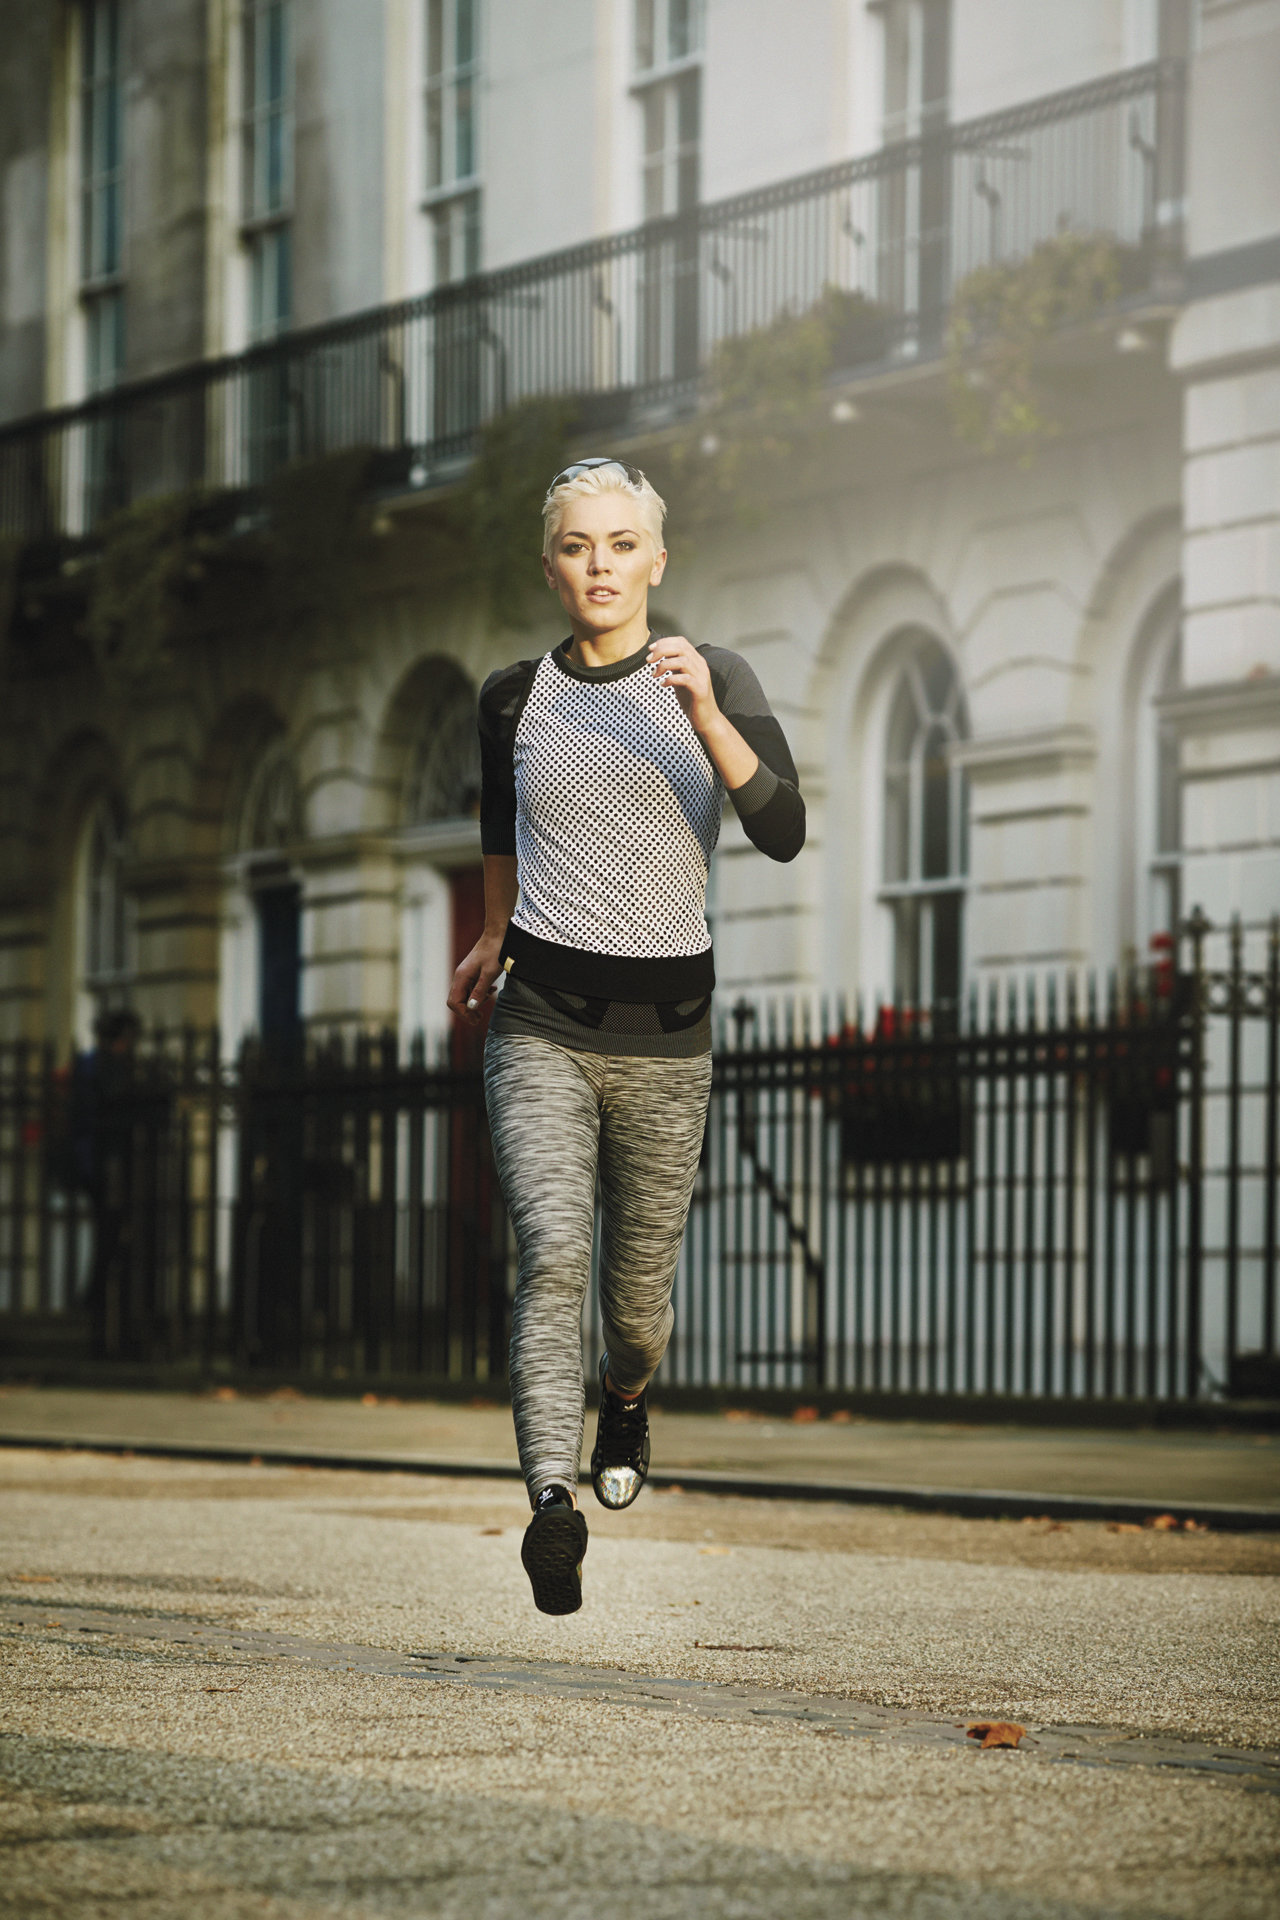 141030-Health&Fitness_S09_041.jpg